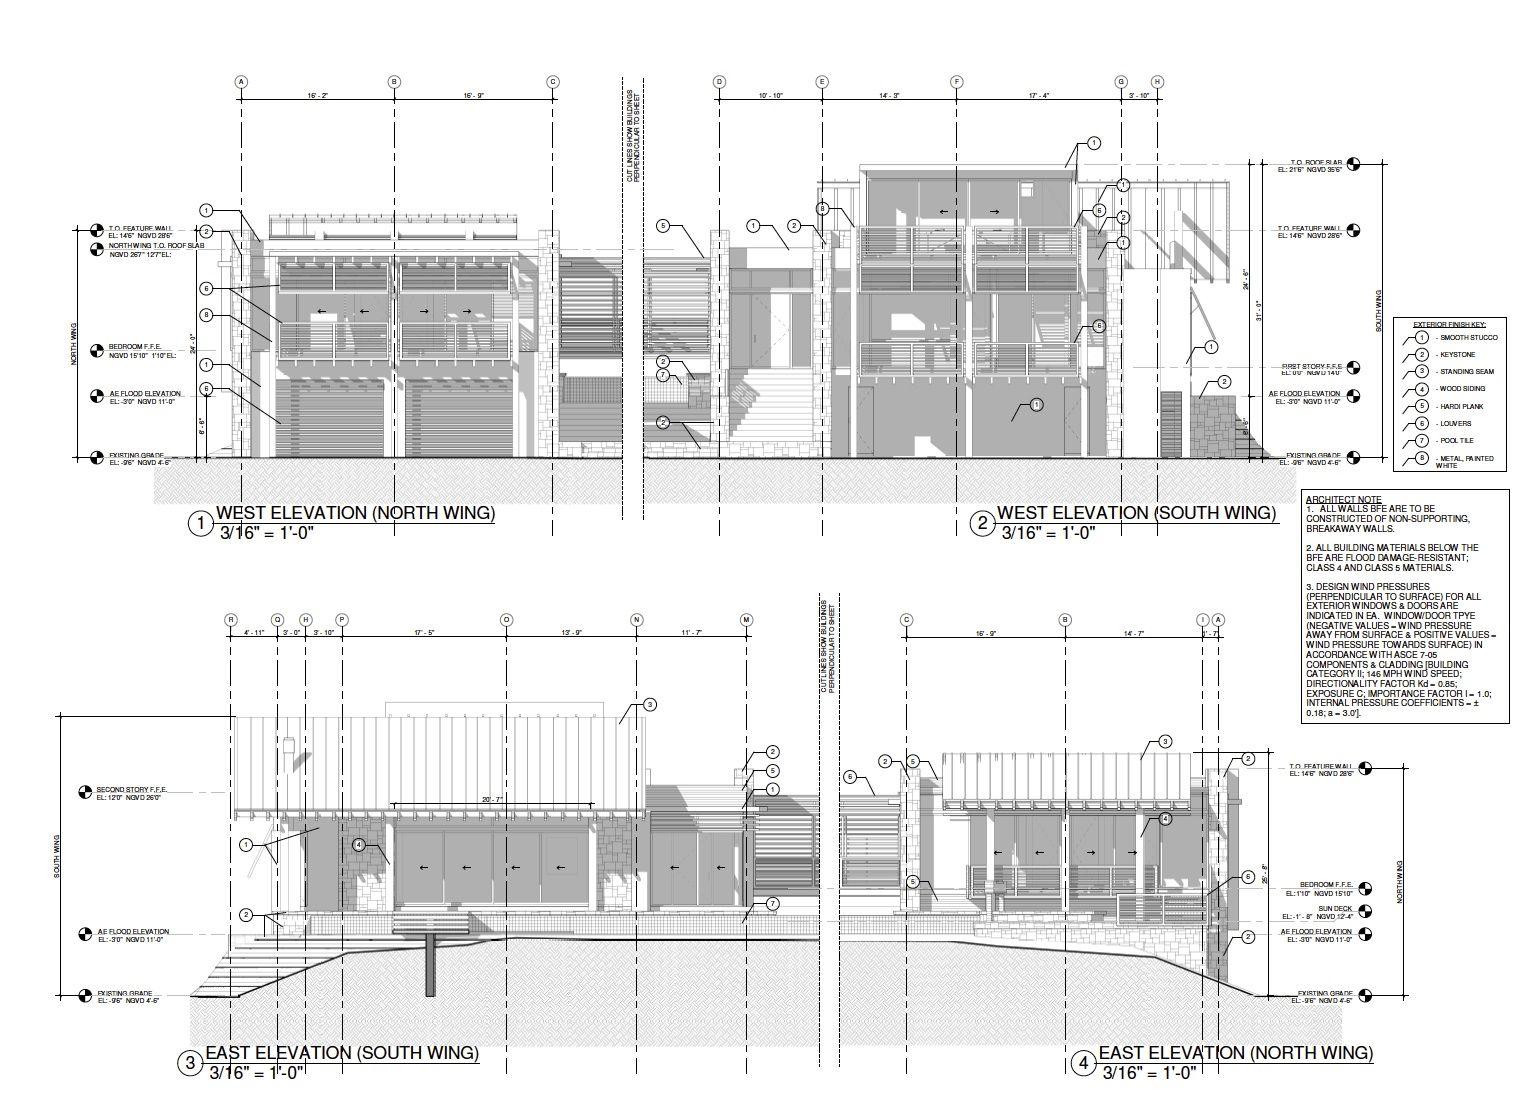 Ballast Trail Elevation Drawings Strang Architecture Elevation Drawing Strang Architecture